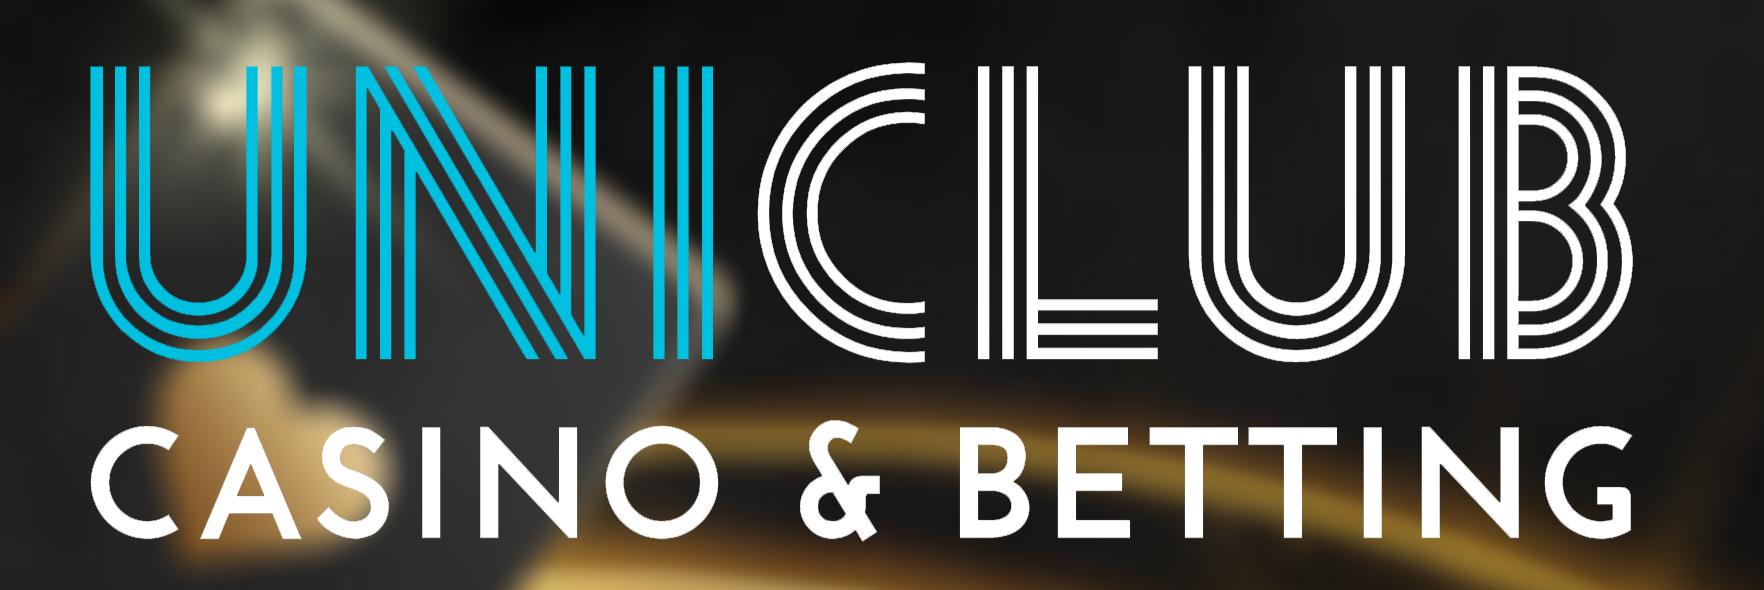 uniclub kazino evolution logo